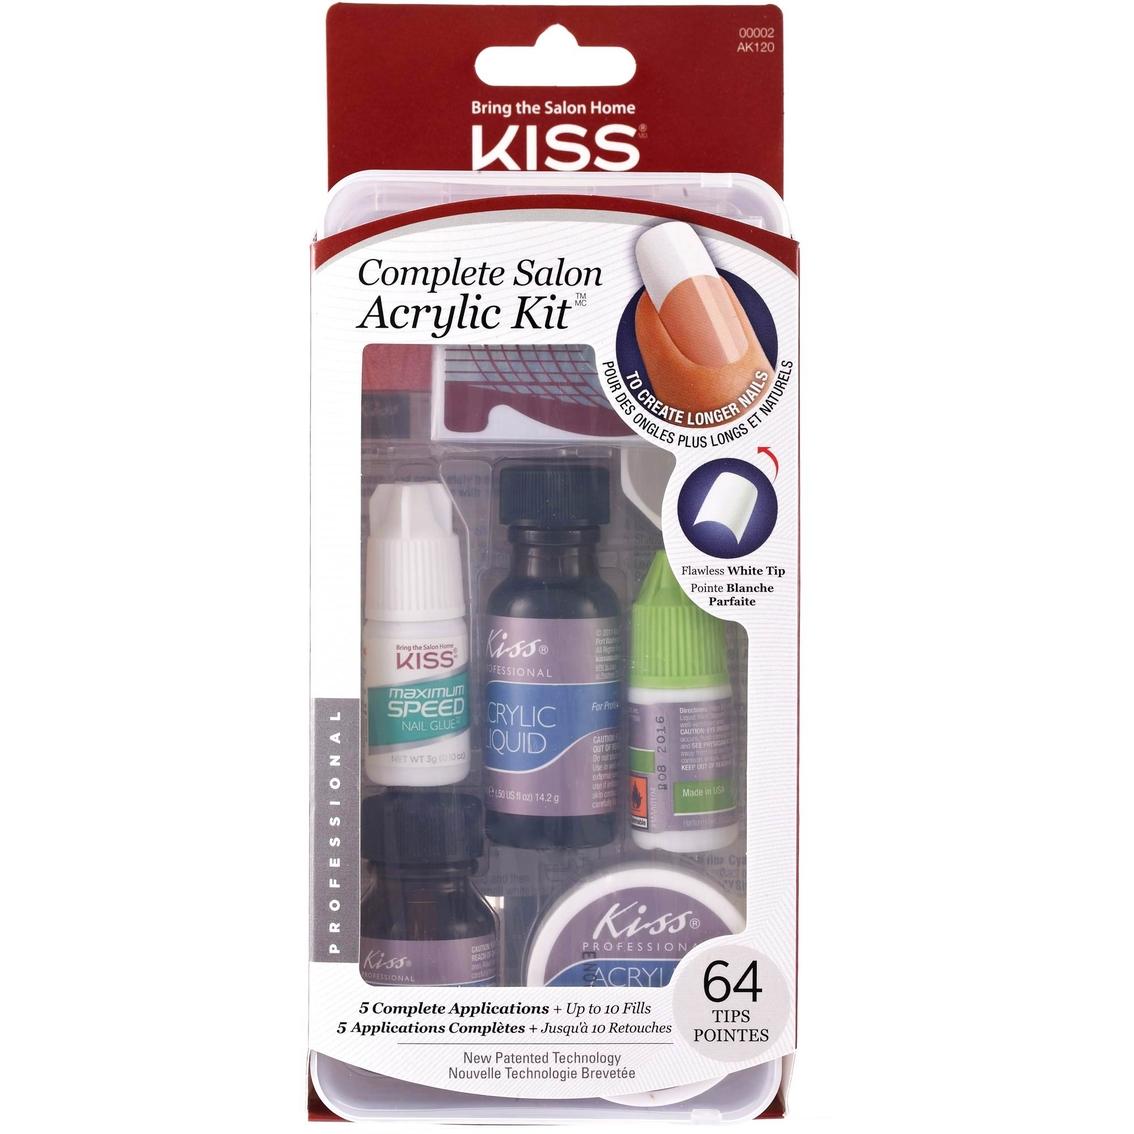 Kiss Complete Salon Acrylic Nail Kit